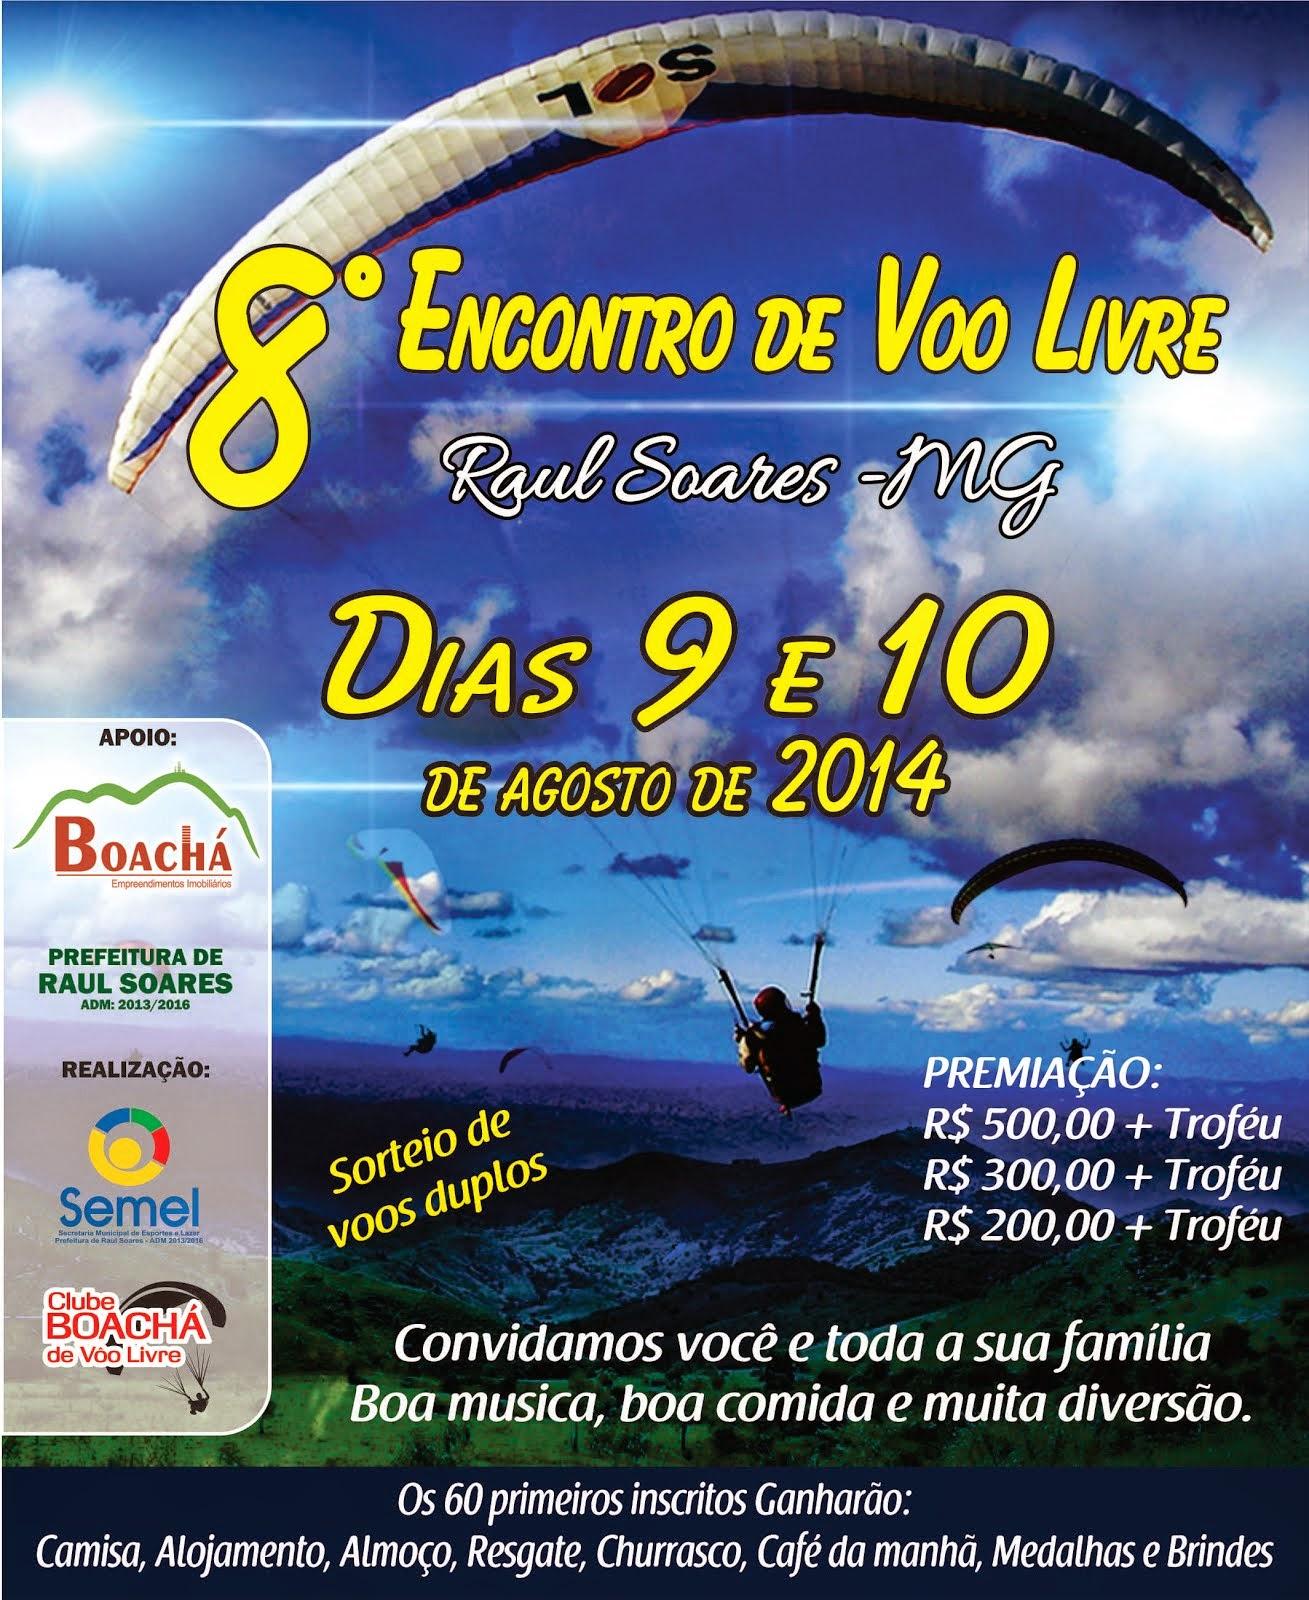 8º Encontro de Vôo Livre de Raul Soares/MG